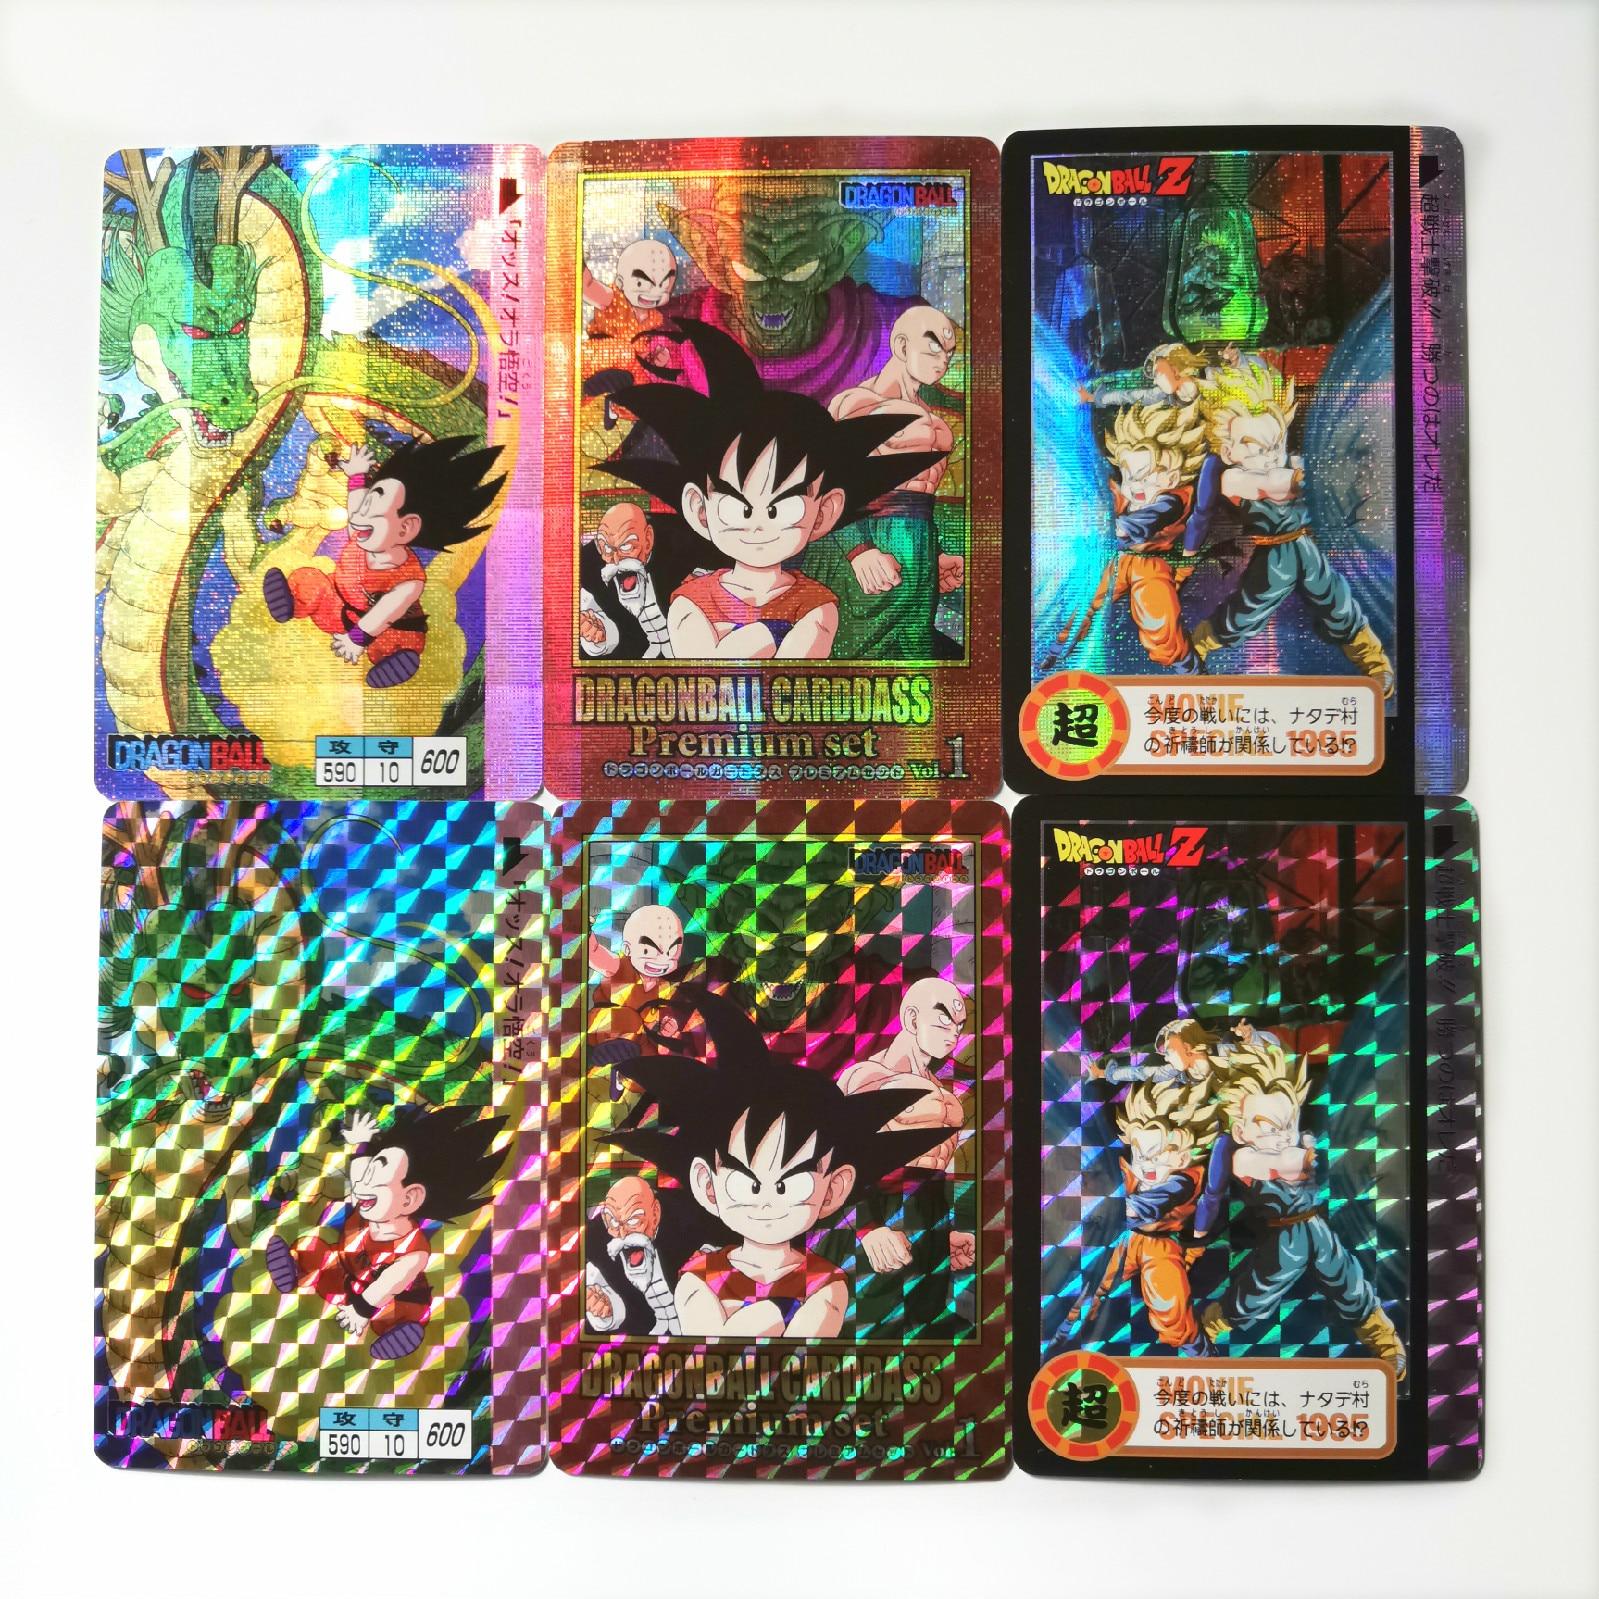 Copy Commemorate Super Dragon Ball Z Heroes Battle Card Ultra Instinct Goku Vegeta Game Collection Cards